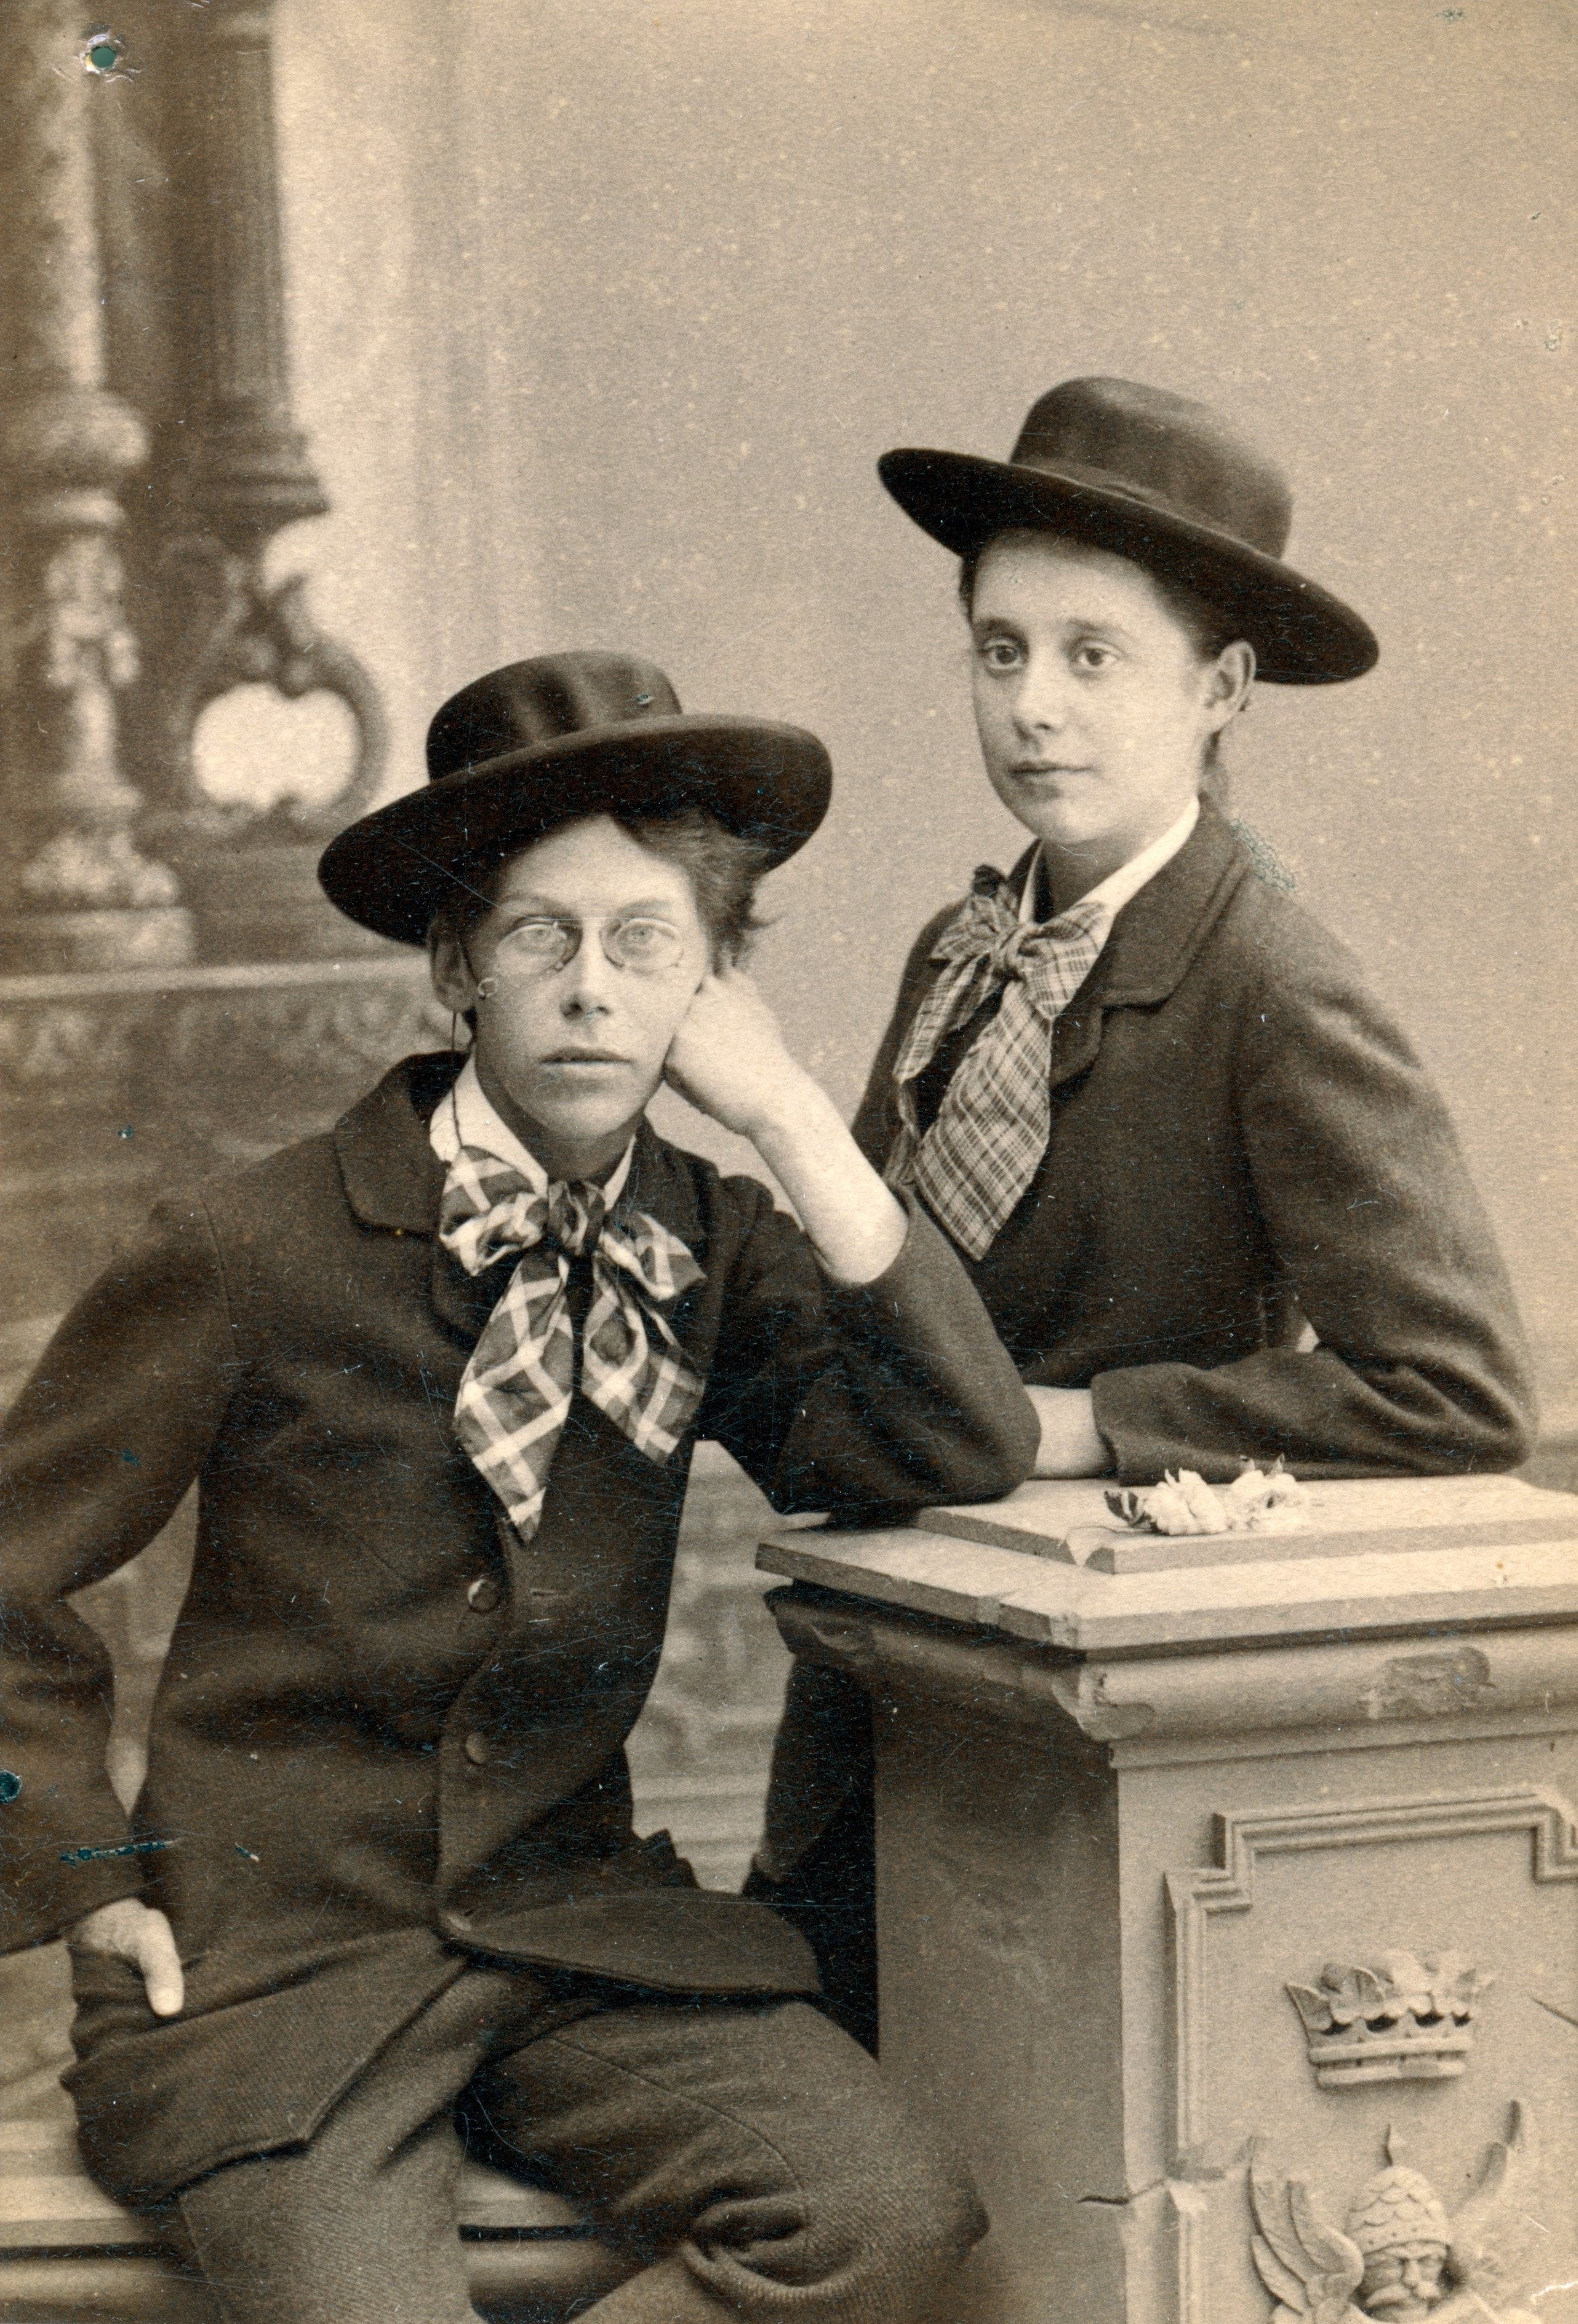 Carin Wästberg (left) with her friend Lotten Rönnquist, circa 1890-1910. Photo: Waldemar Dahllöf (1844-1935). Bohusläns museum